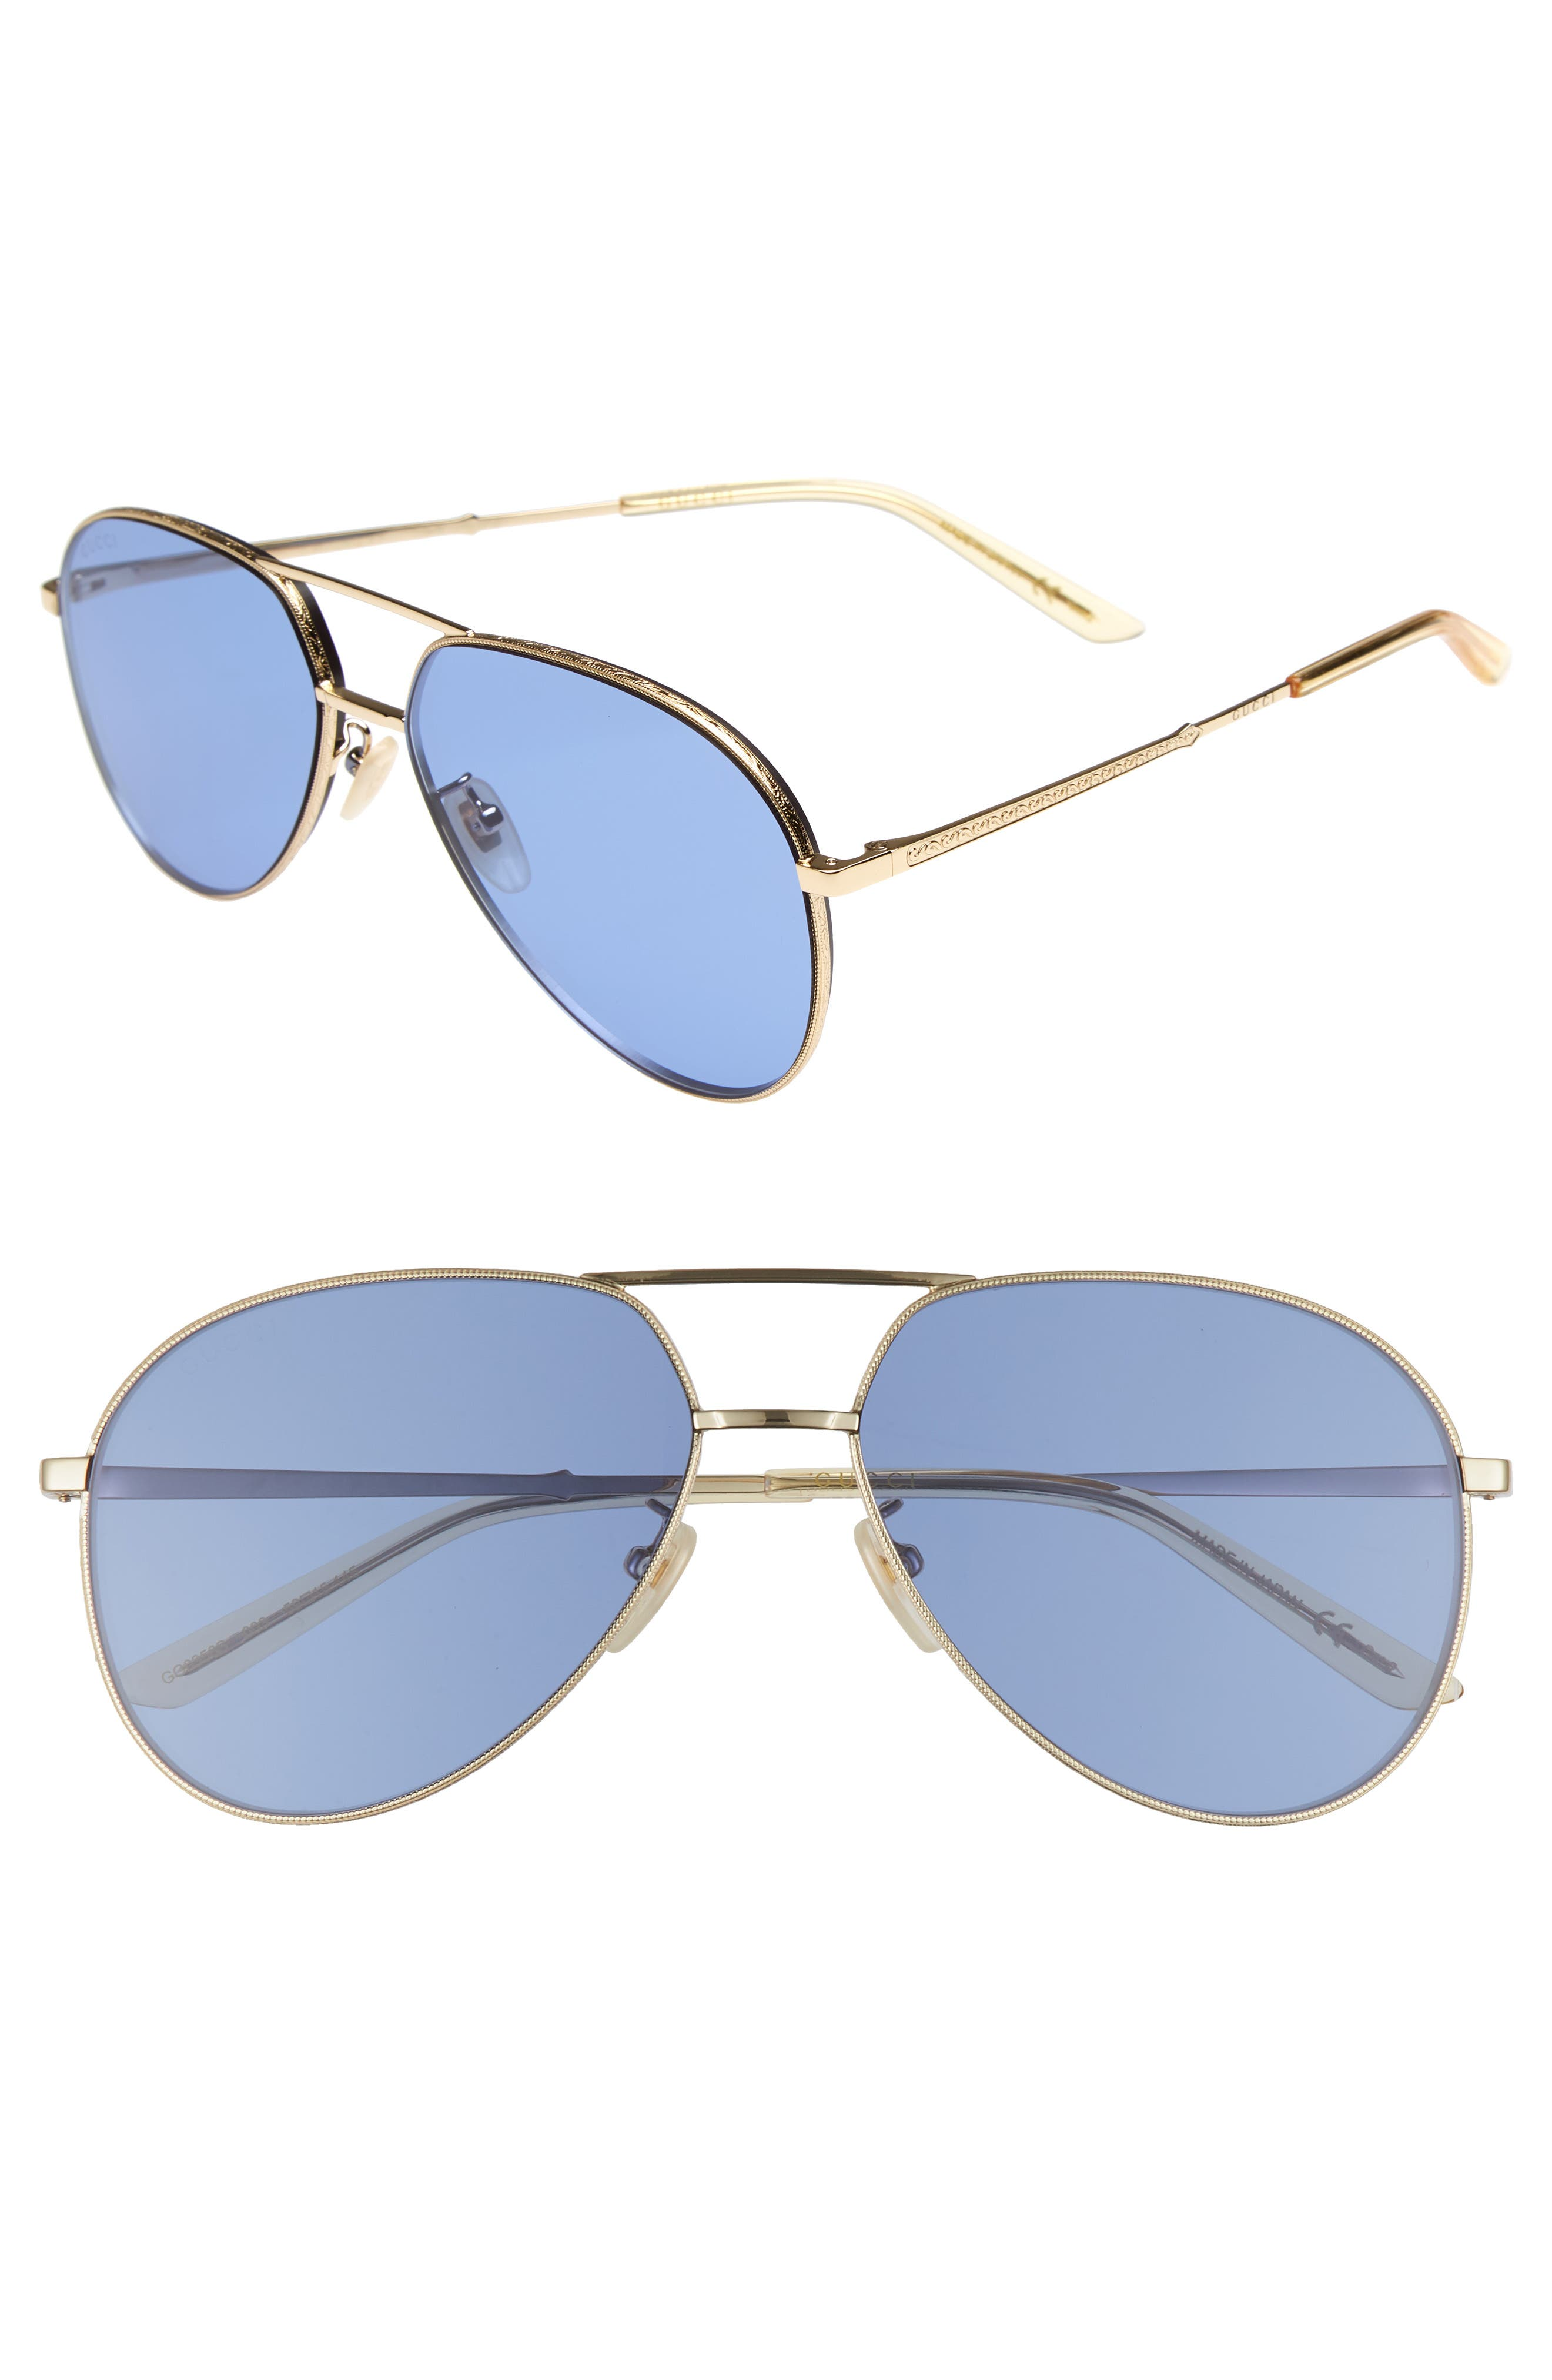 59mm Aviator Sunglasses,                             Main thumbnail 1, color,                             GOLD/ YELLOW